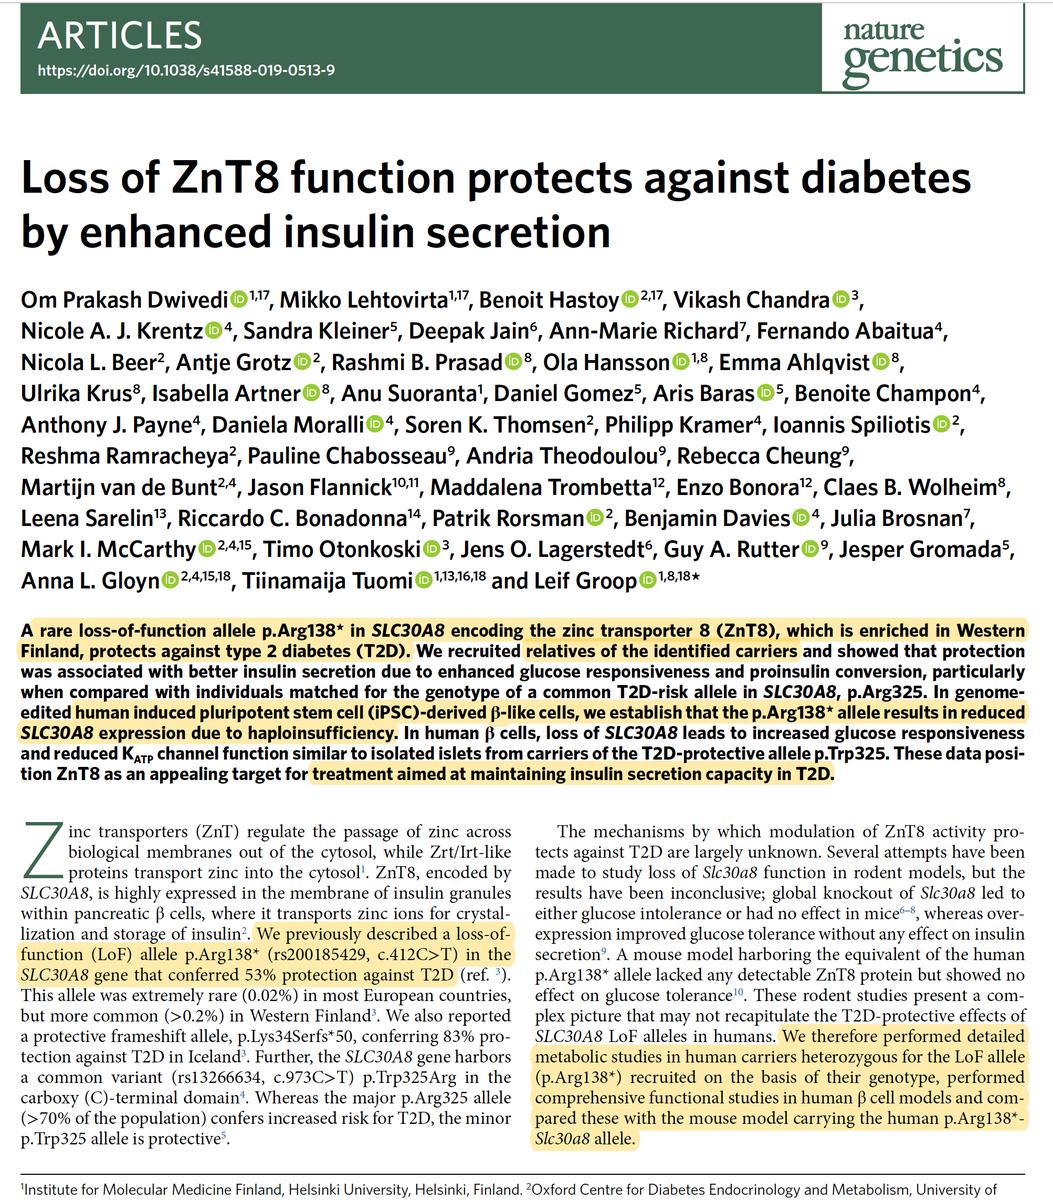 test Twitter Media - Setting a new standard for asserting that a rare allele is protective for a disease: human studies, replication, iPSC, #CRISPR, multiple models https://t.co/7jLVhuI1yR or https://t.co/rpRaiESk5z #T2DM #diabetes @FIMM_UH @lehtovitra @GroopLeif @legroop1 @CoECDG @FolkhalsanRC et al https://t.co/YYhteXUhxm